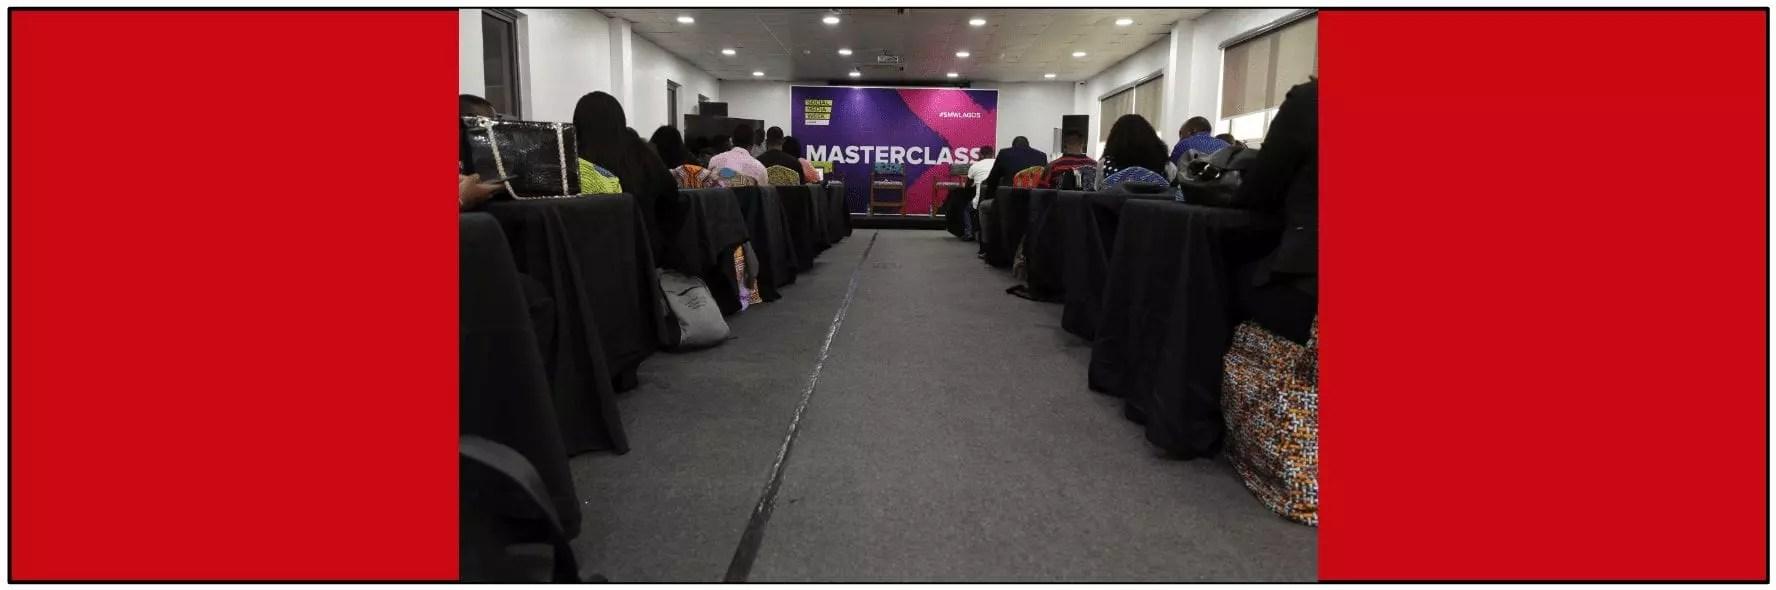 Bra Willy Seyama   eNitiate   SMW Lagos 2020   Feb 26   Masterclass   Feature